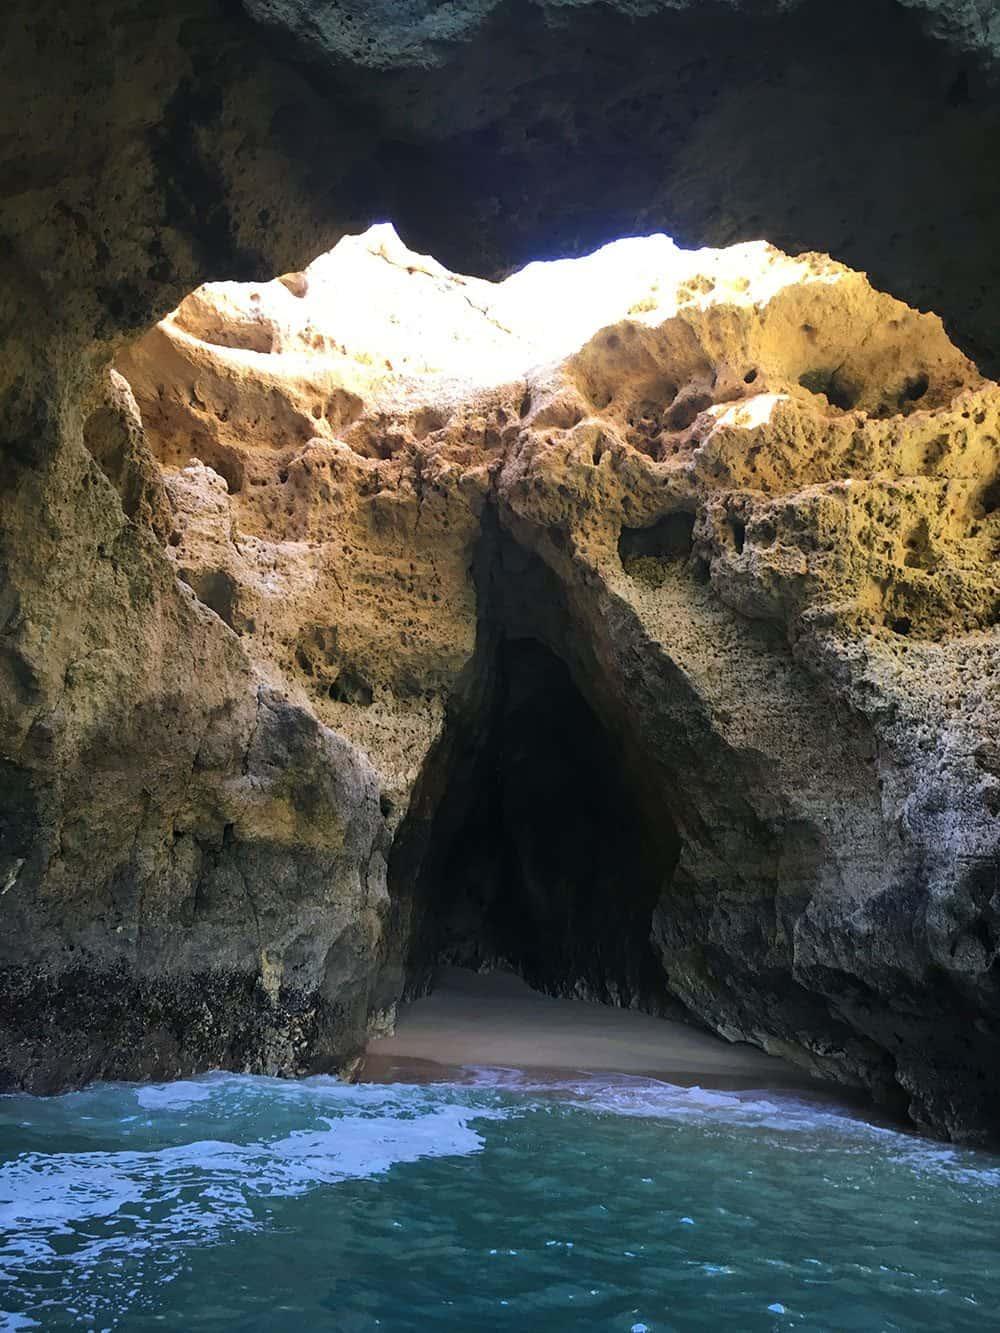 Passeio-de-barco-pelas-grutas-e-praias-saindo-da-Praia-de-Benagil